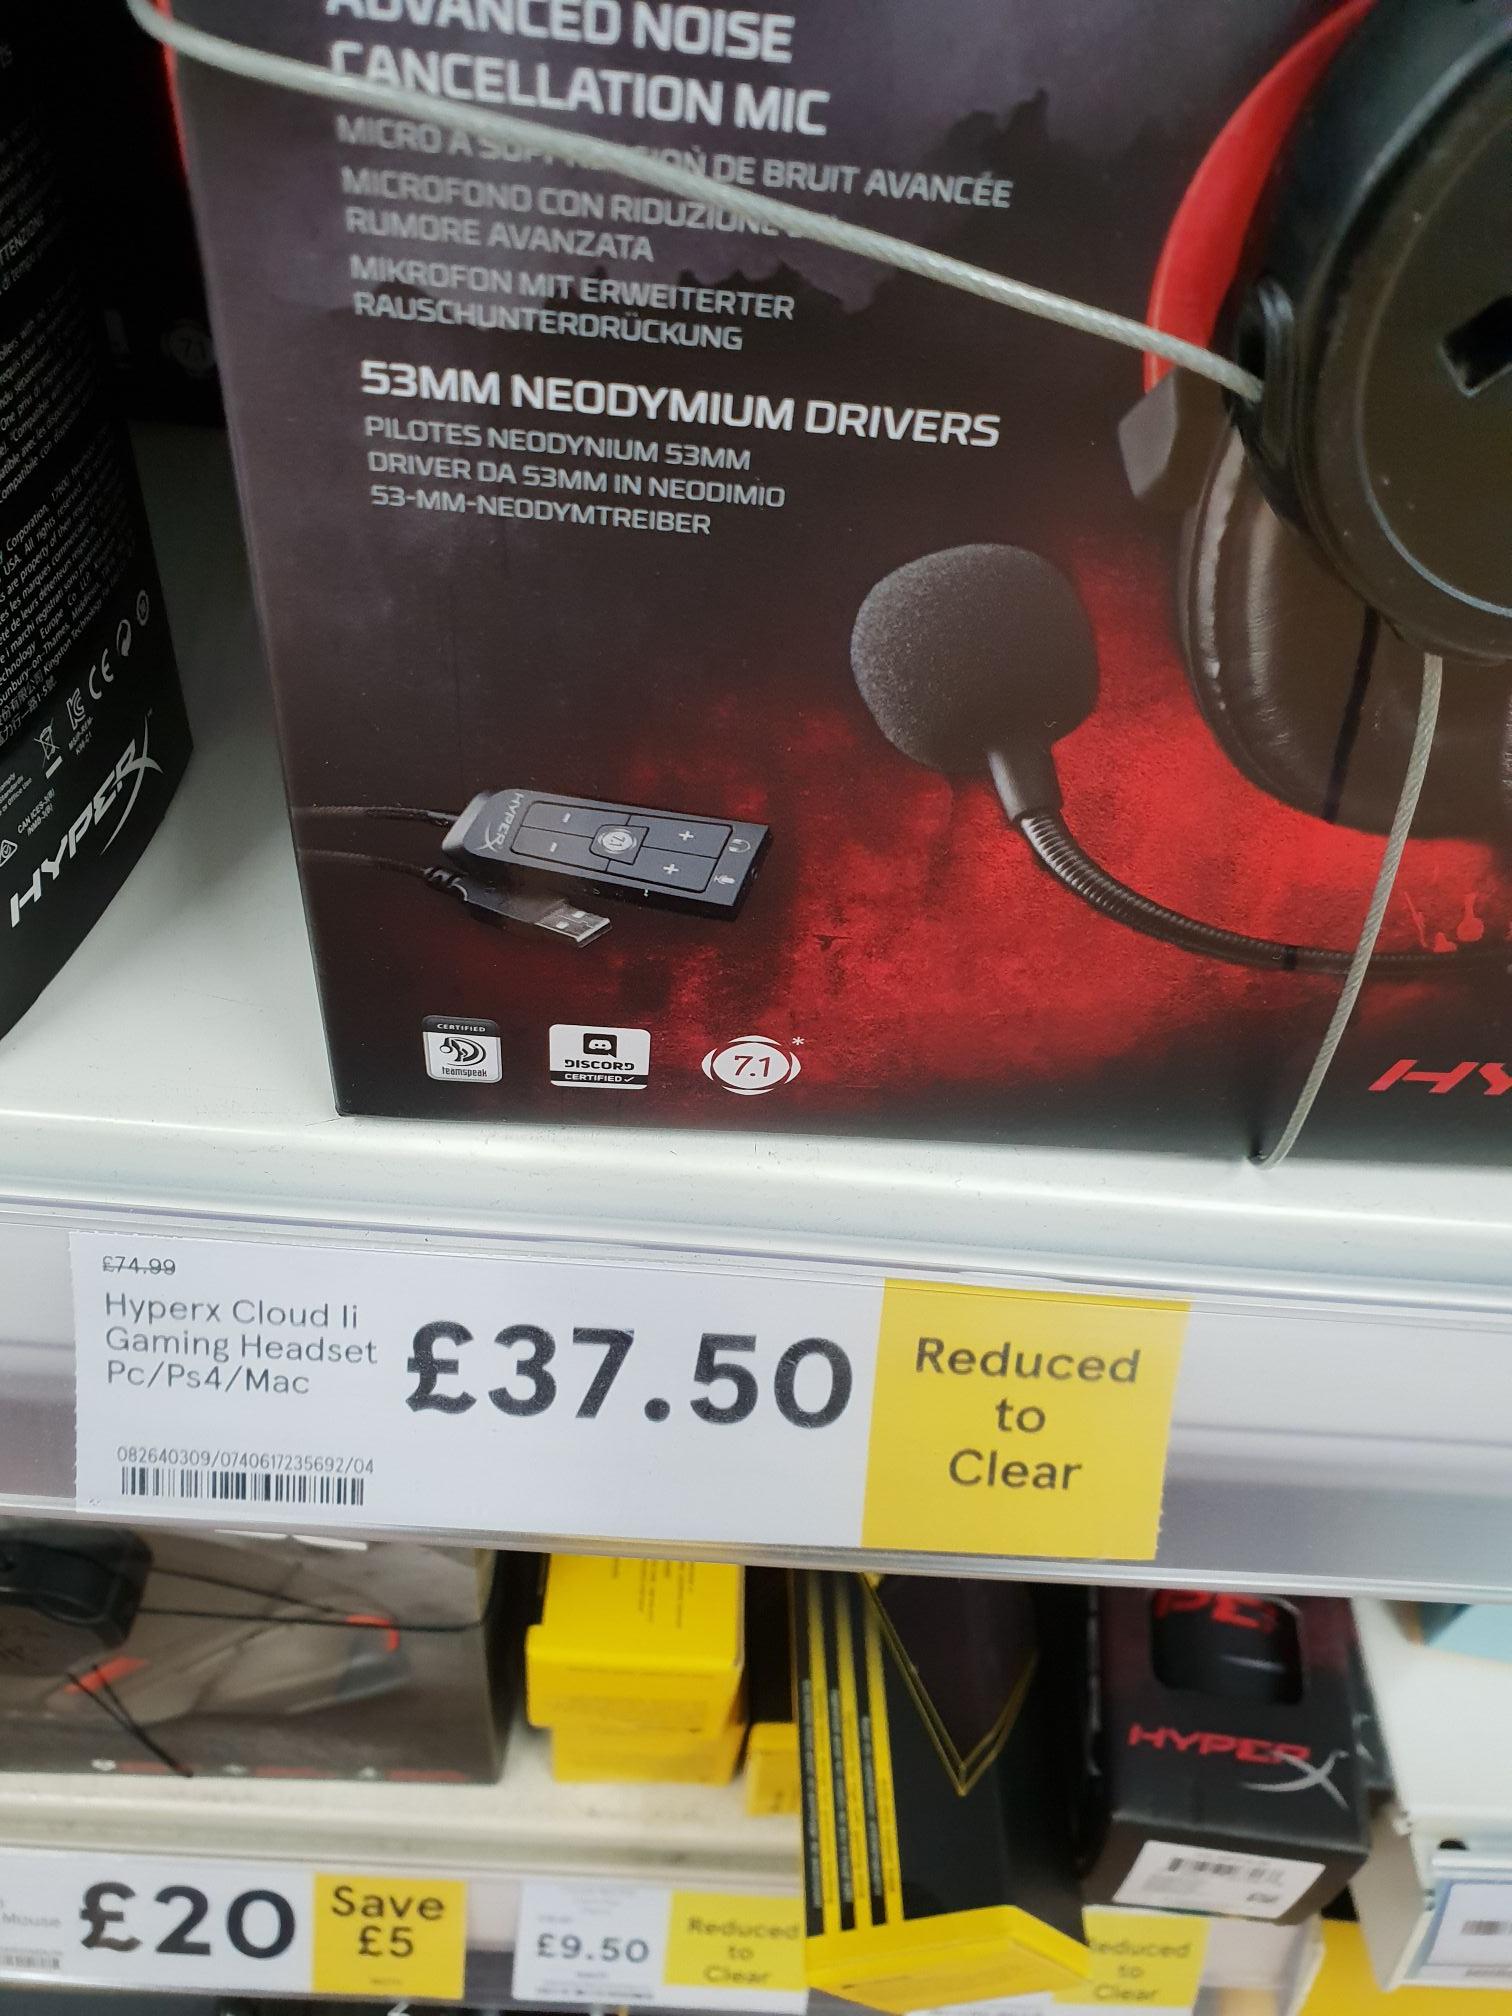 HyperX Cloud ll Headphones, down to £37.50 at Tesco instore